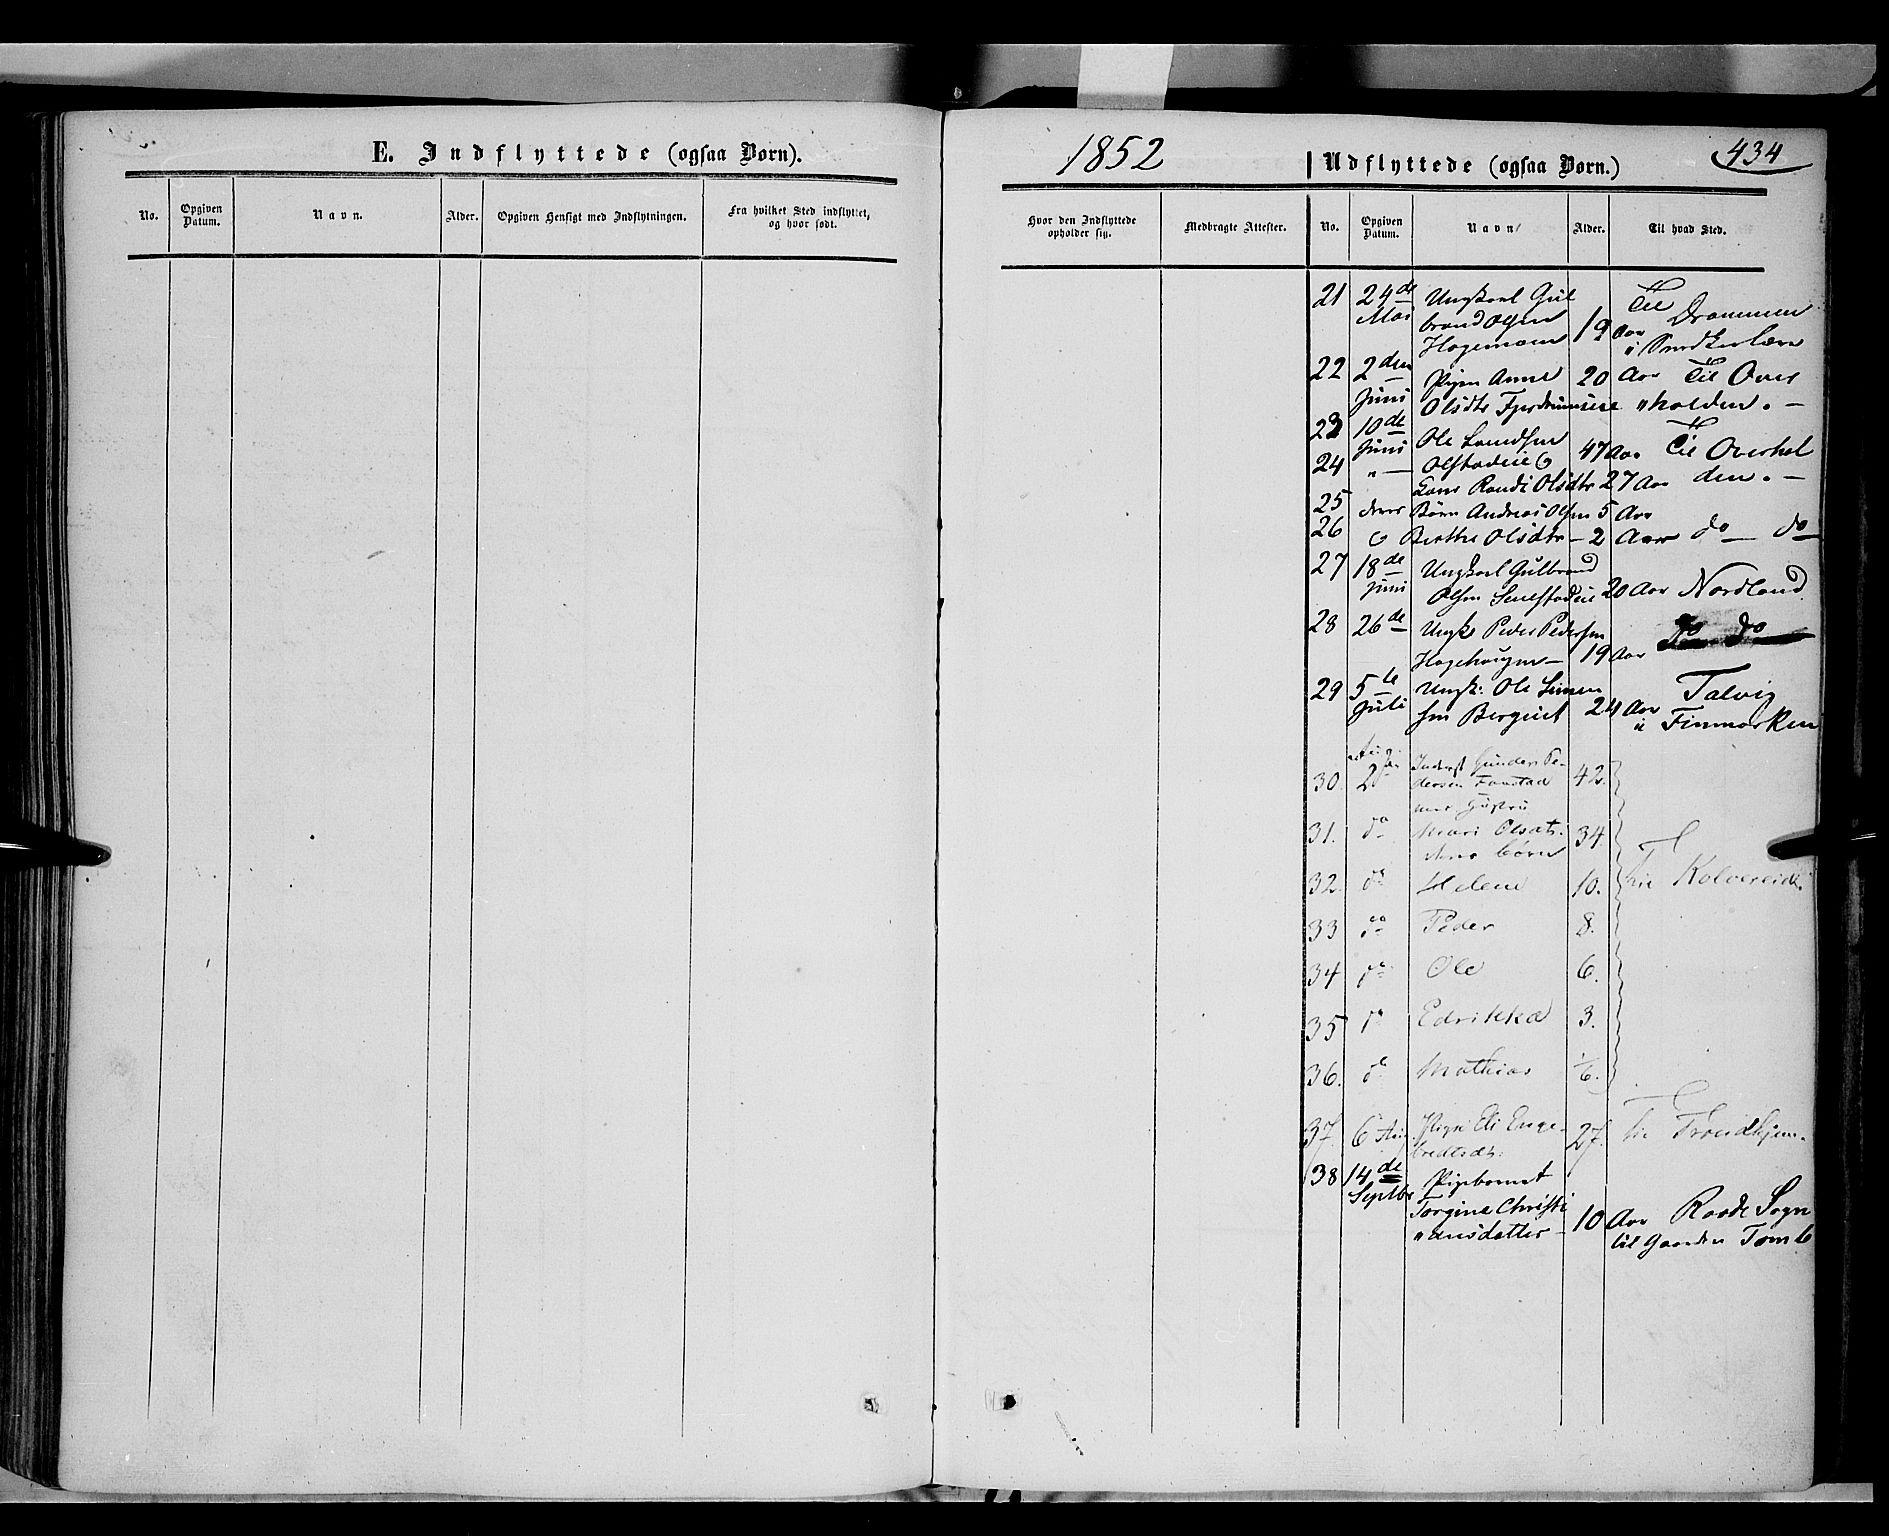 SAH, Gausdal prestekontor, Ministerialbok nr. 8, 1850-1861, s. 434